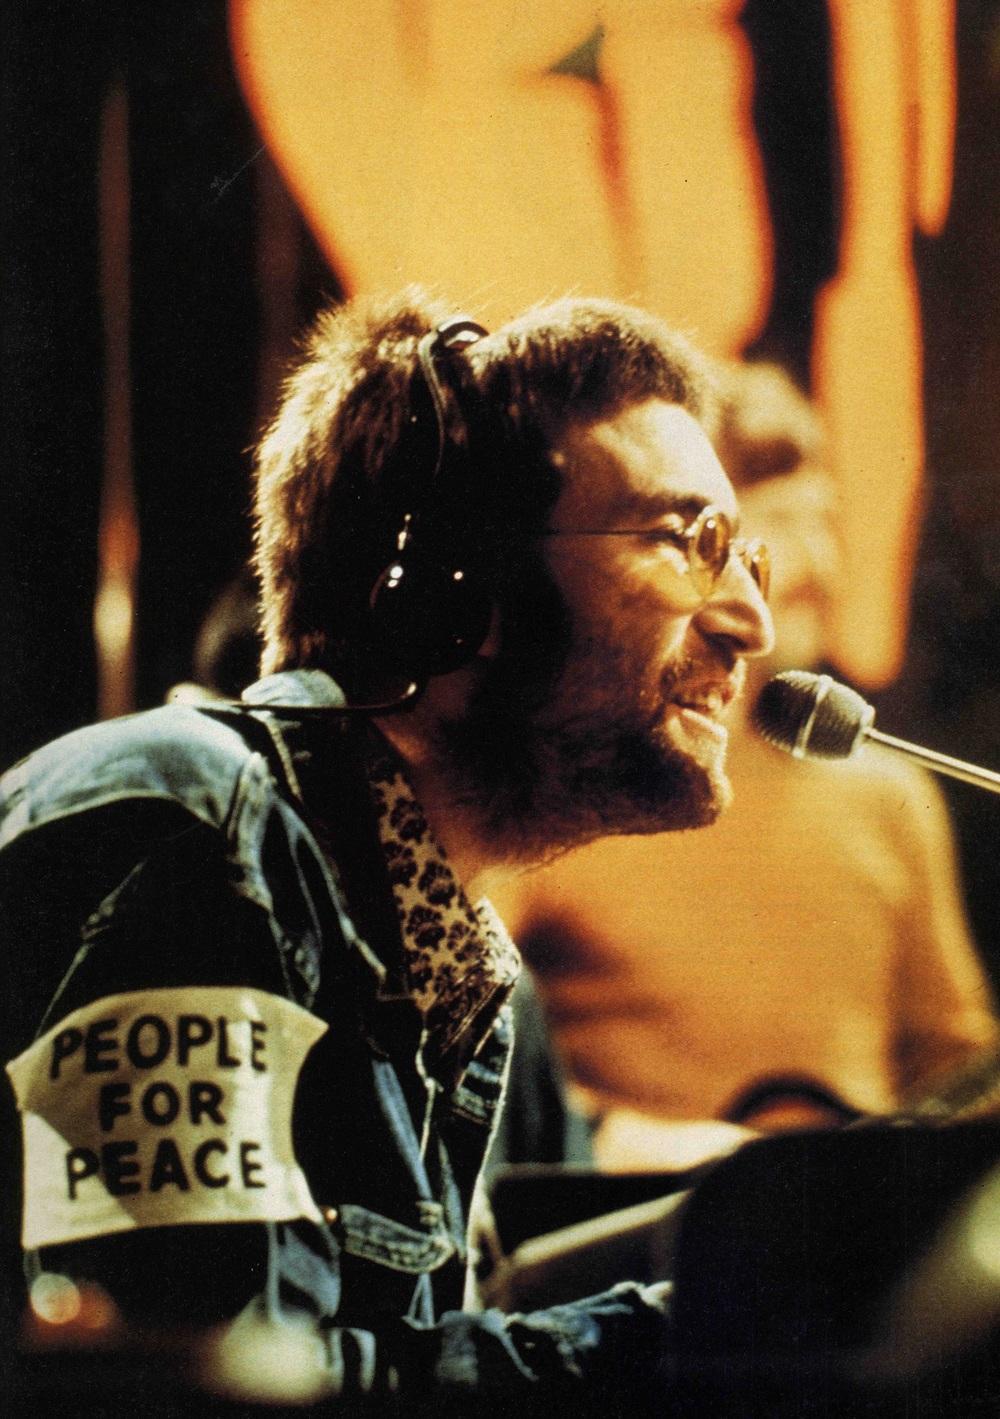 John Lennon performing Instant Karma, 1970.